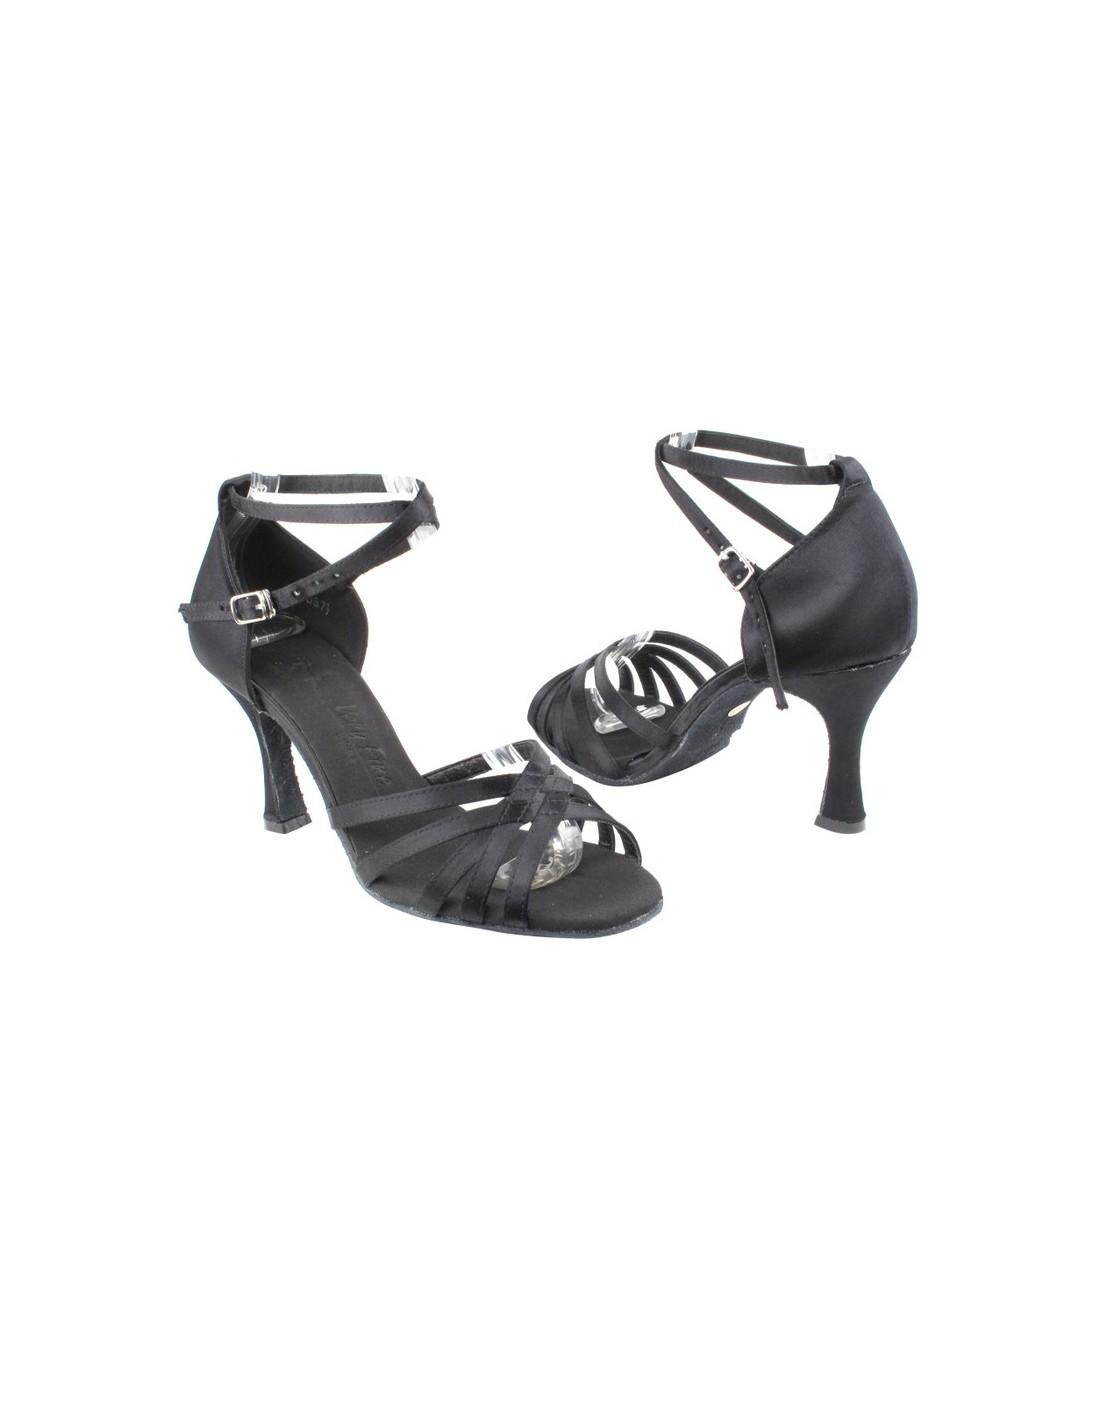 e4528f1de Ladies dance shoe in black satin with ankle strap for salsa ...